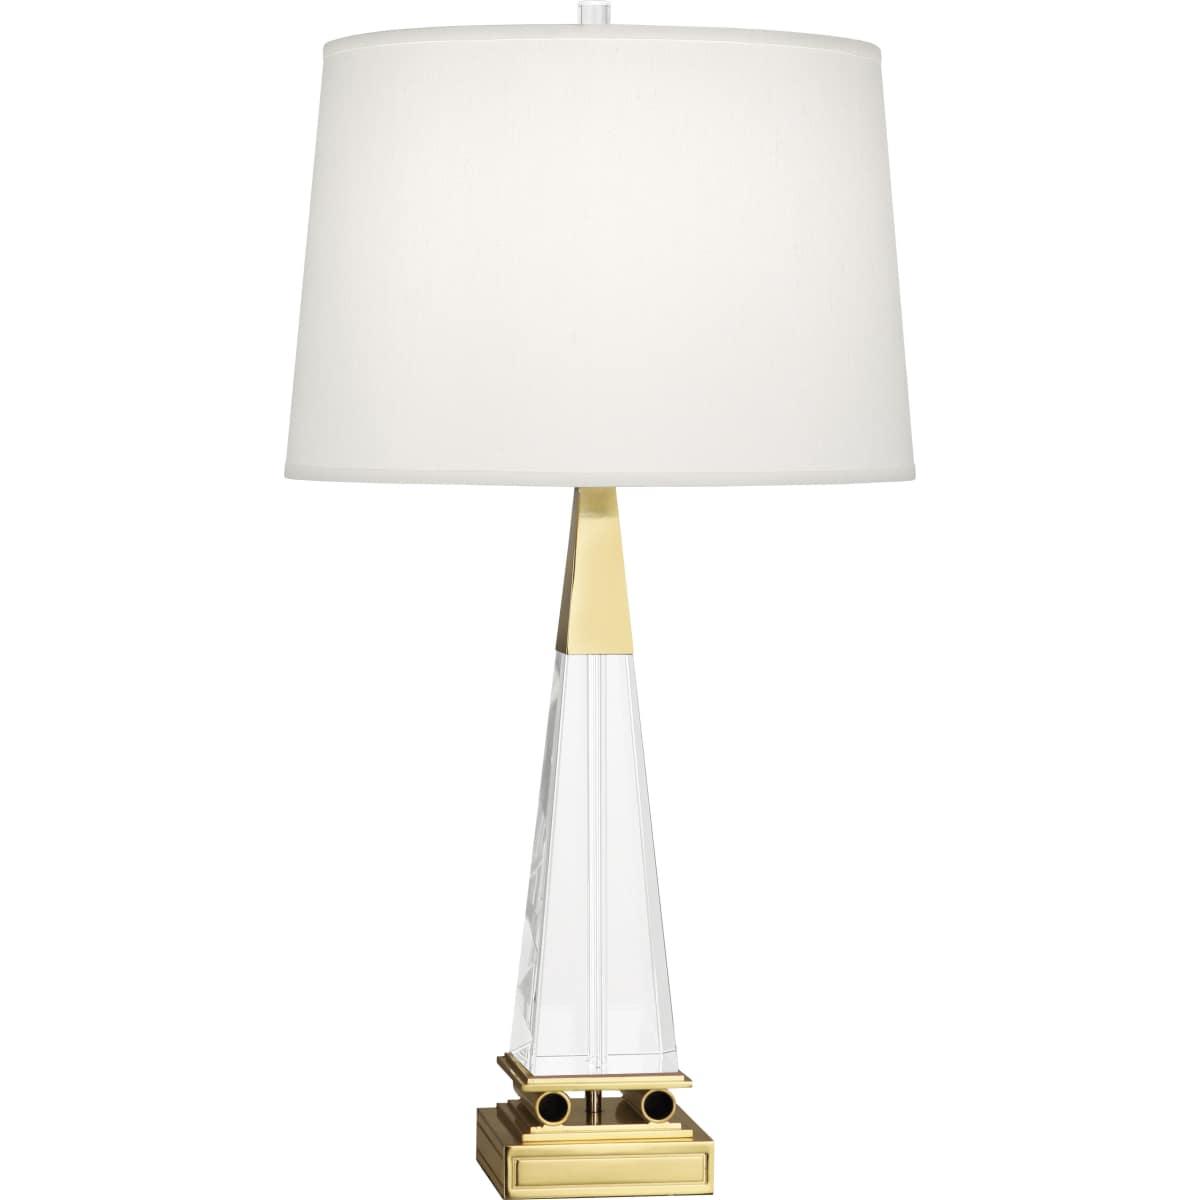 Robert Abbey 156 Modern Brass Darius 29 Column Table Lamp With A Dupioni Fabric Shade Lightingshowplace Com